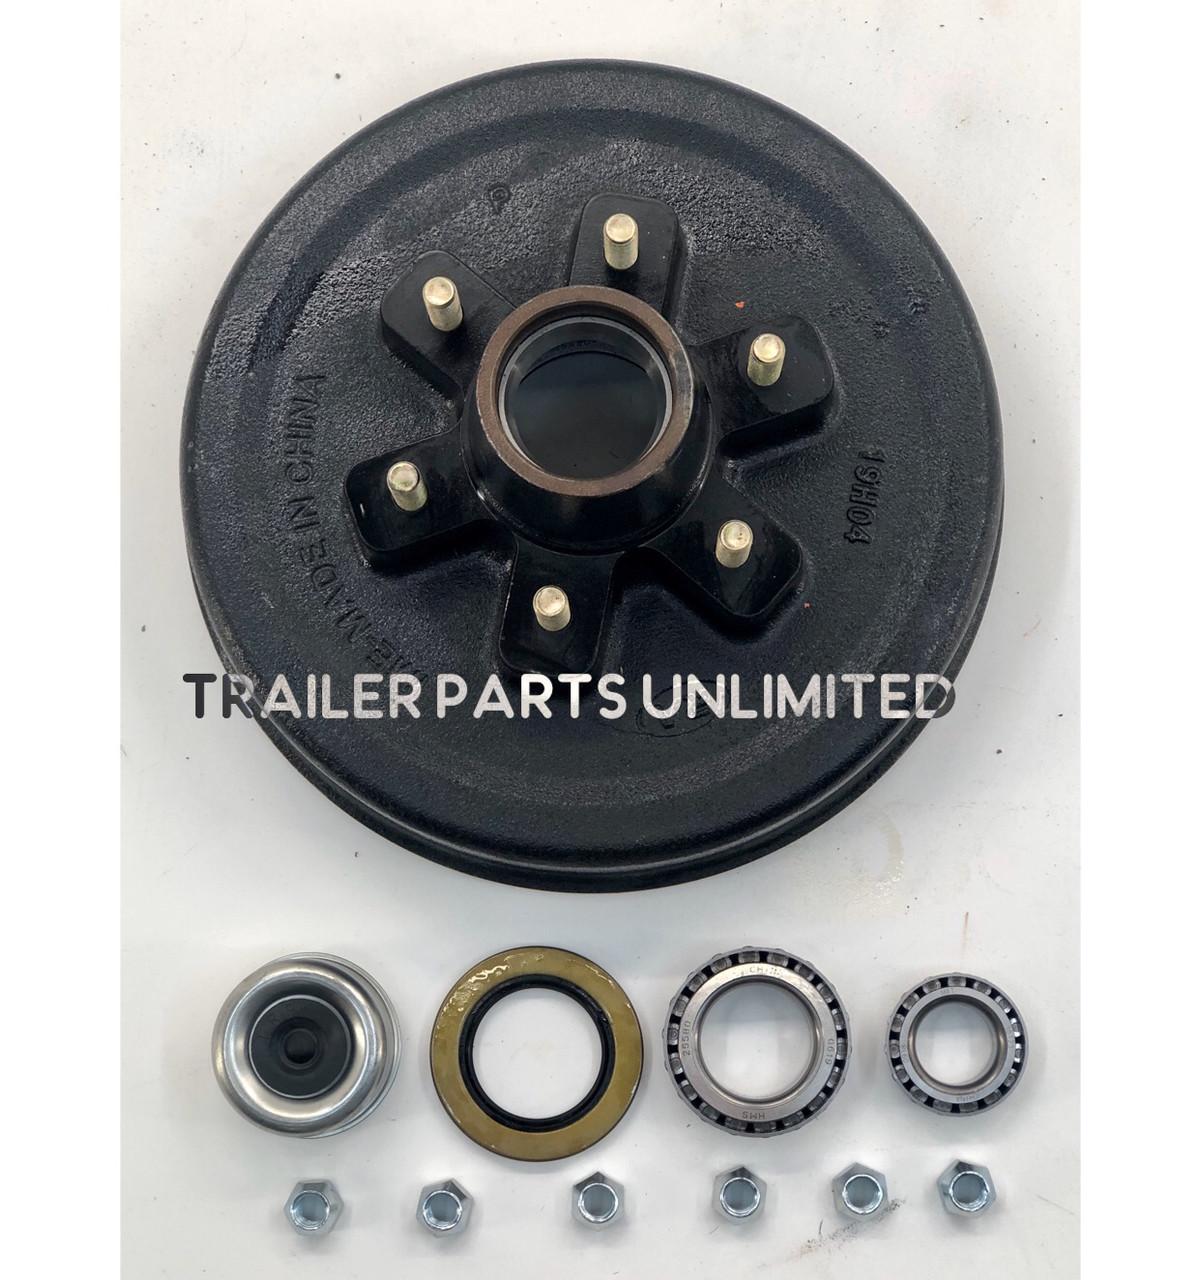 Add U Bolts, 85 Hubface-70 Spring Center 5.2k-5200 Lb Capacity 12x2 Electric Brake Trailer Axle 6 Lug-Dexter Compatible 60Frame